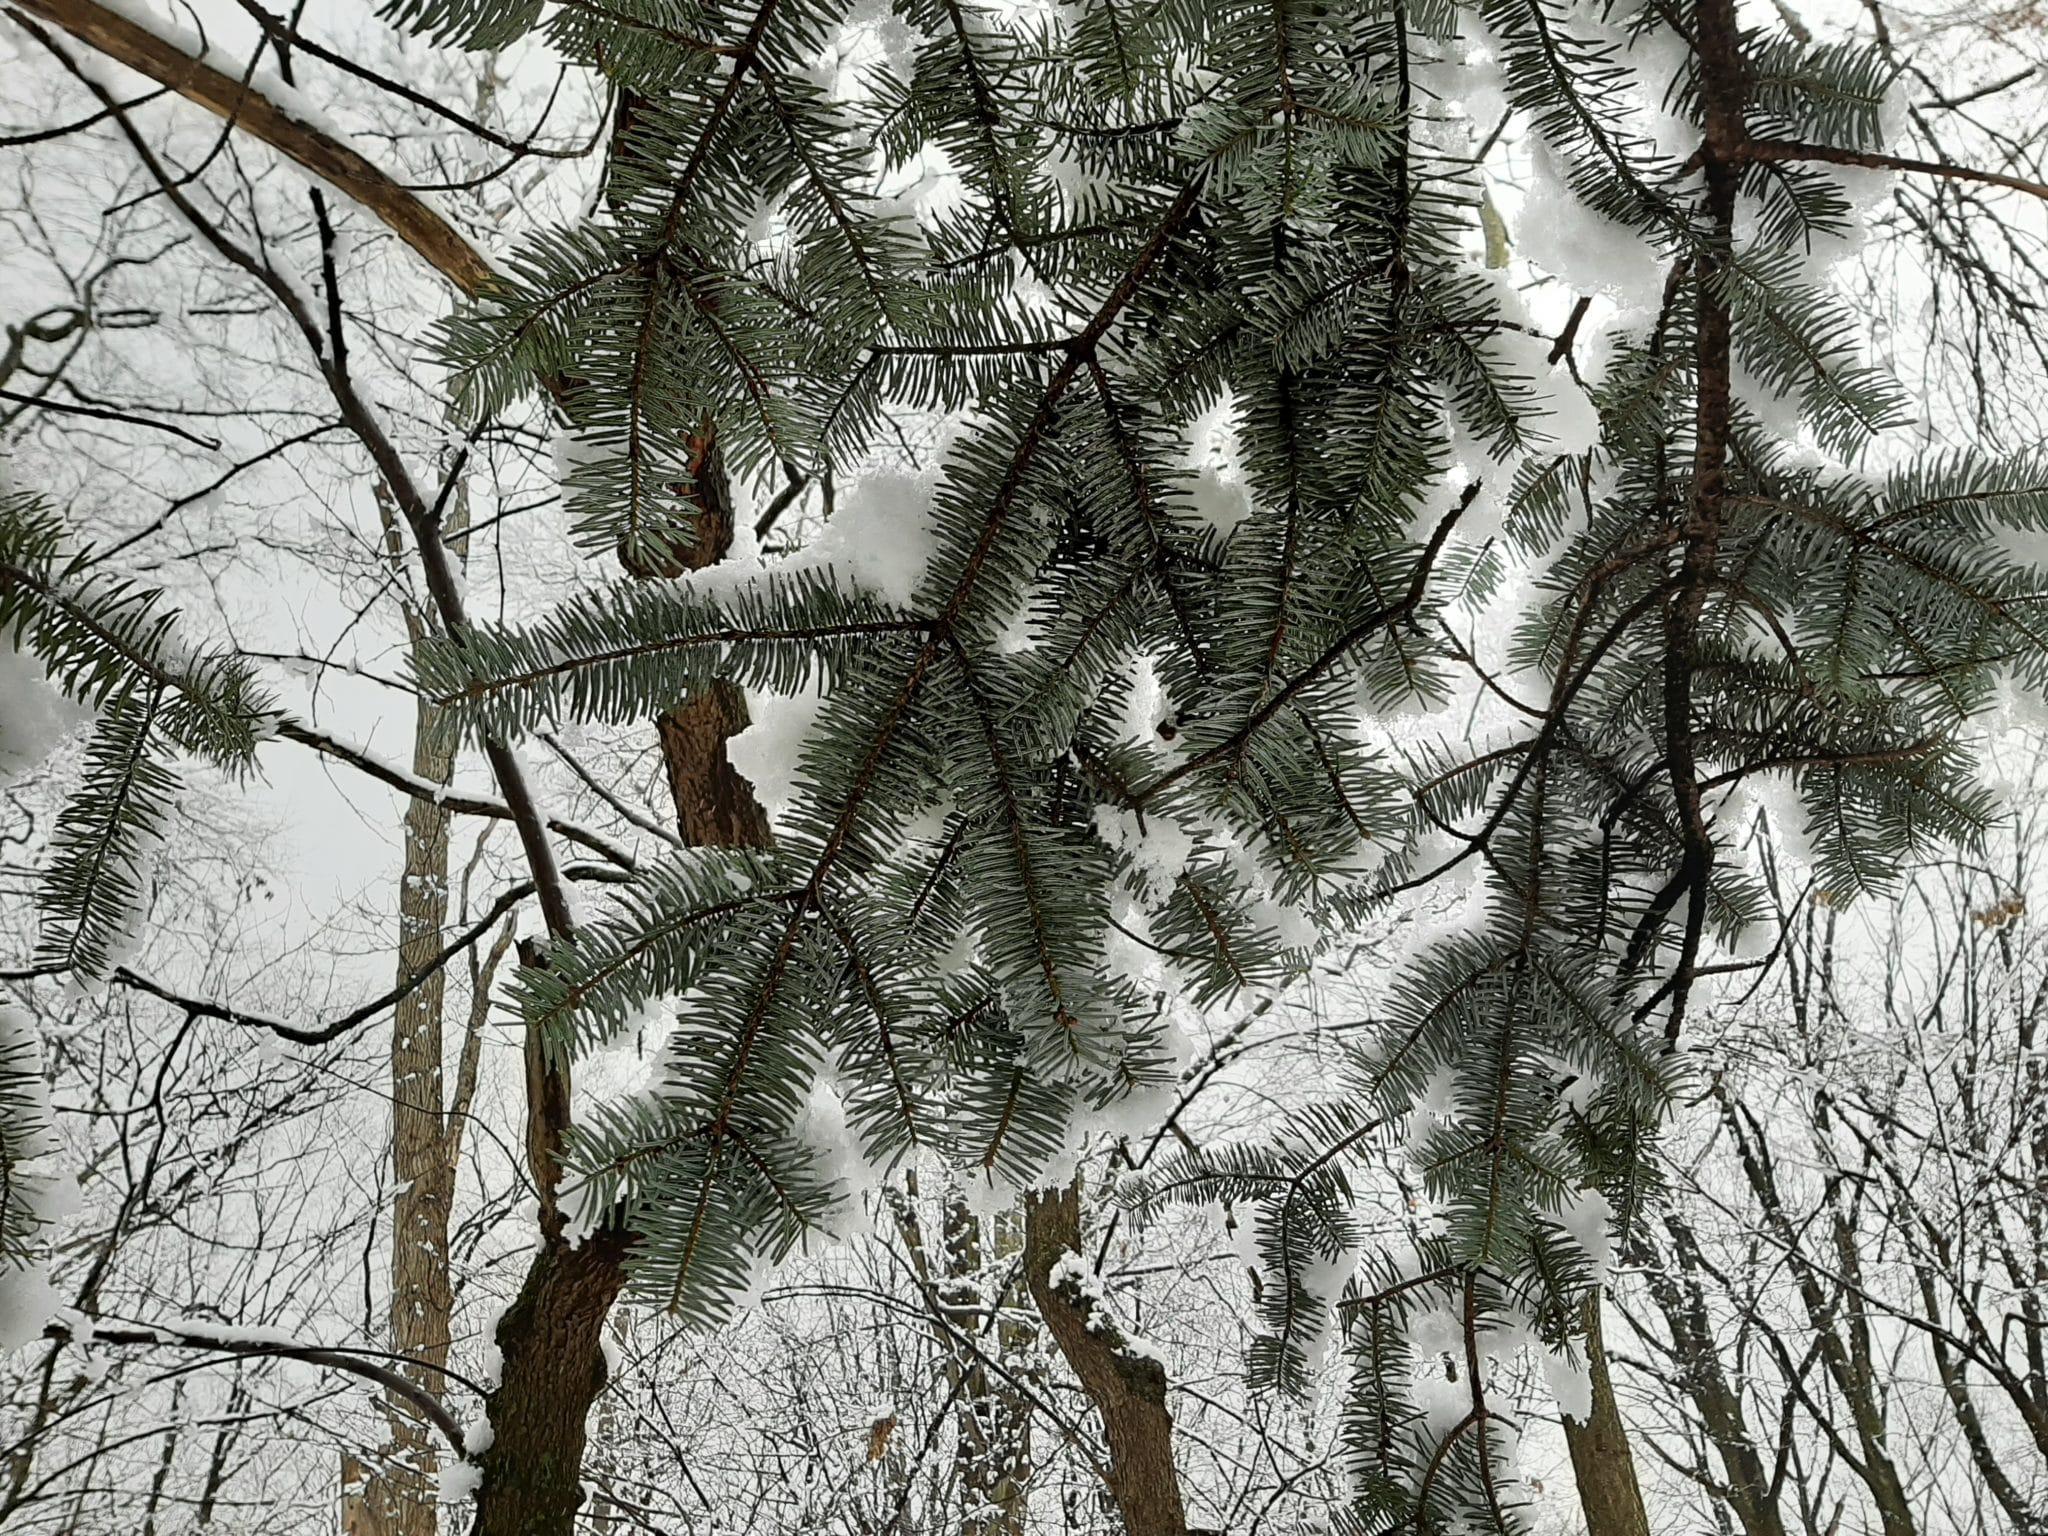 Evergreen tree in snow